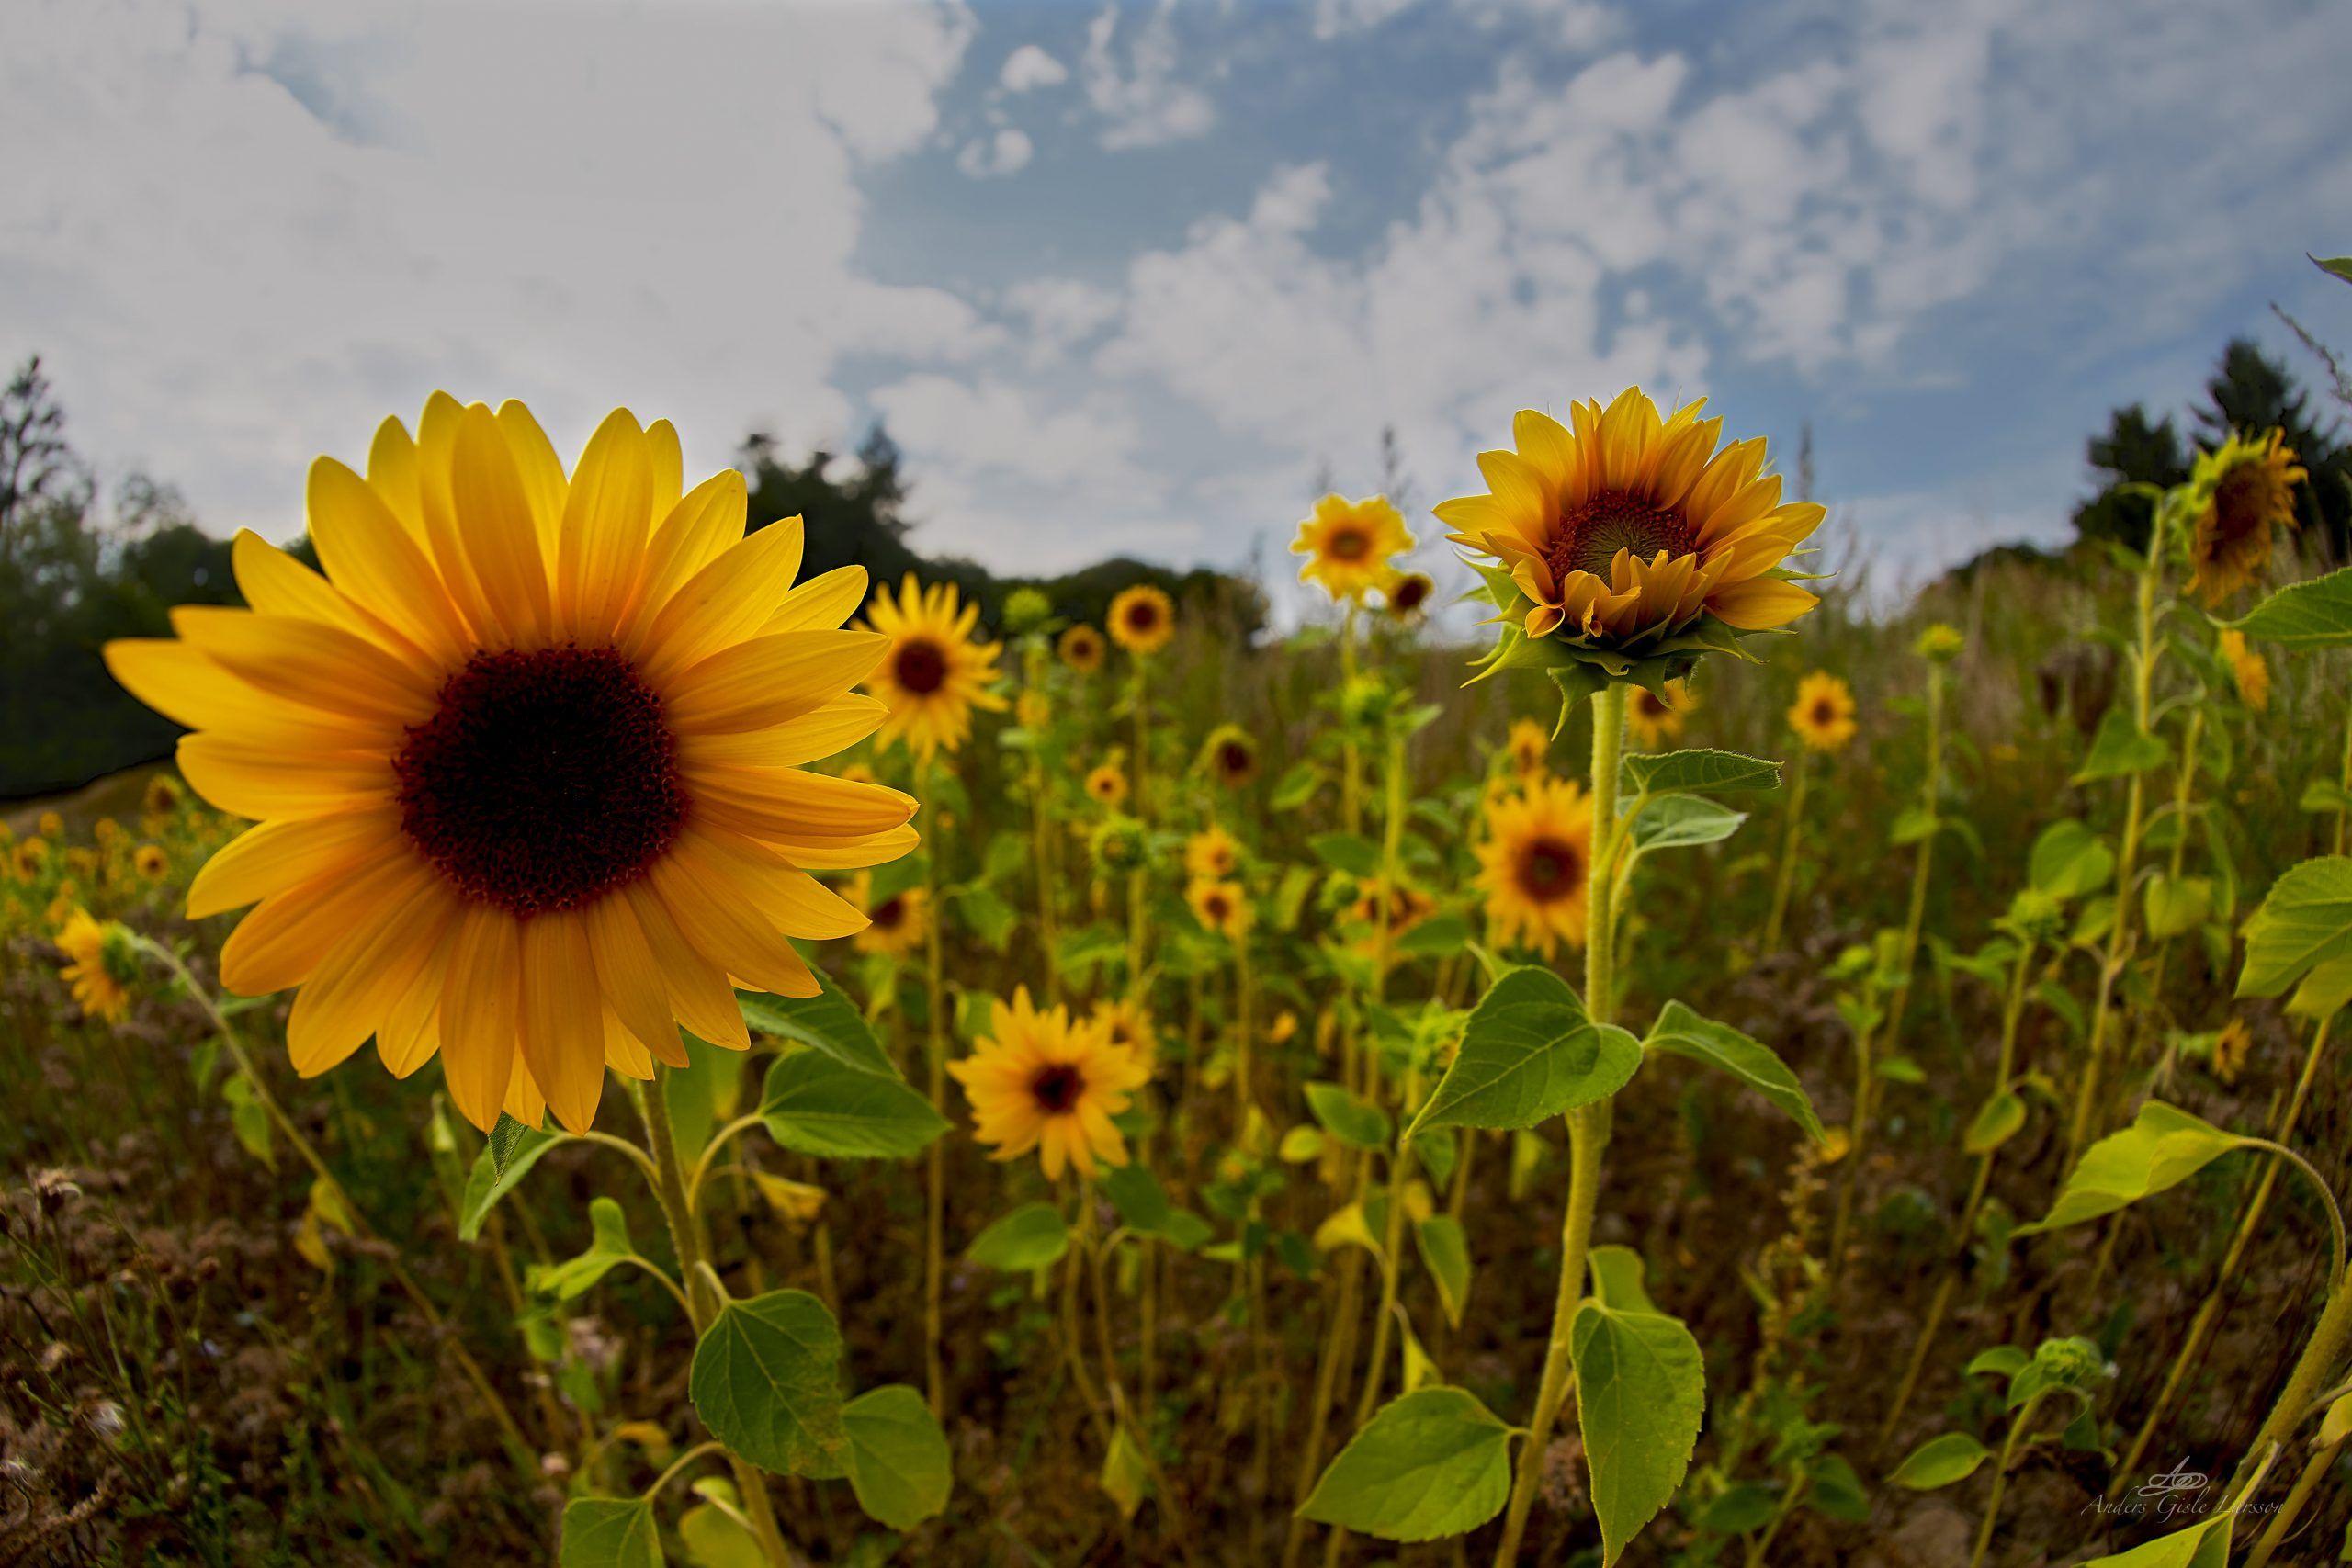 Eternal Sunshine, 211/365, Uge 31, Ammelhede, Assentoft, Randers